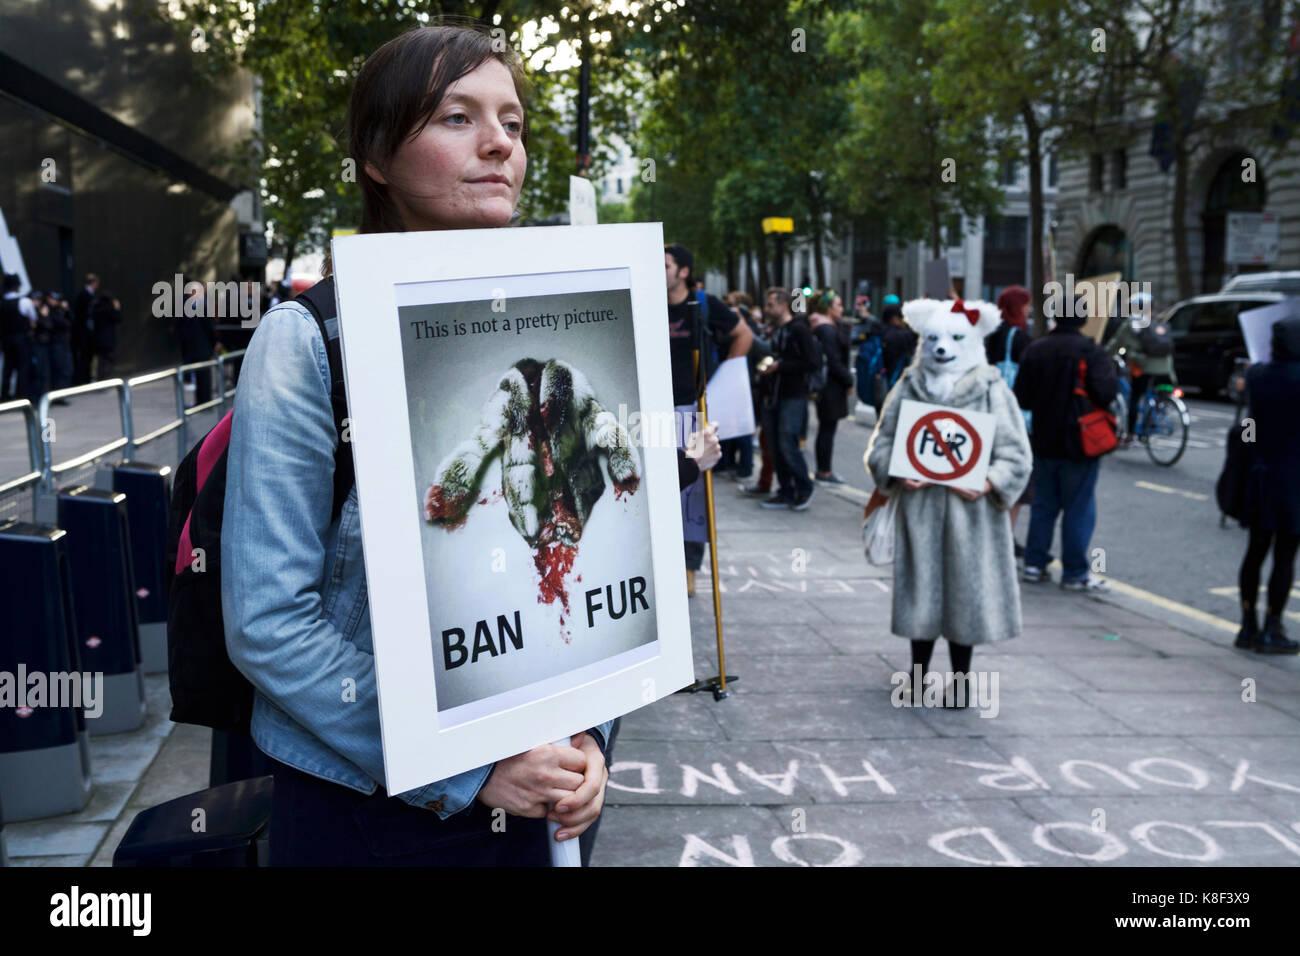 Anti Fur Protesters Stock Photos & Anti Fur Protesters ...